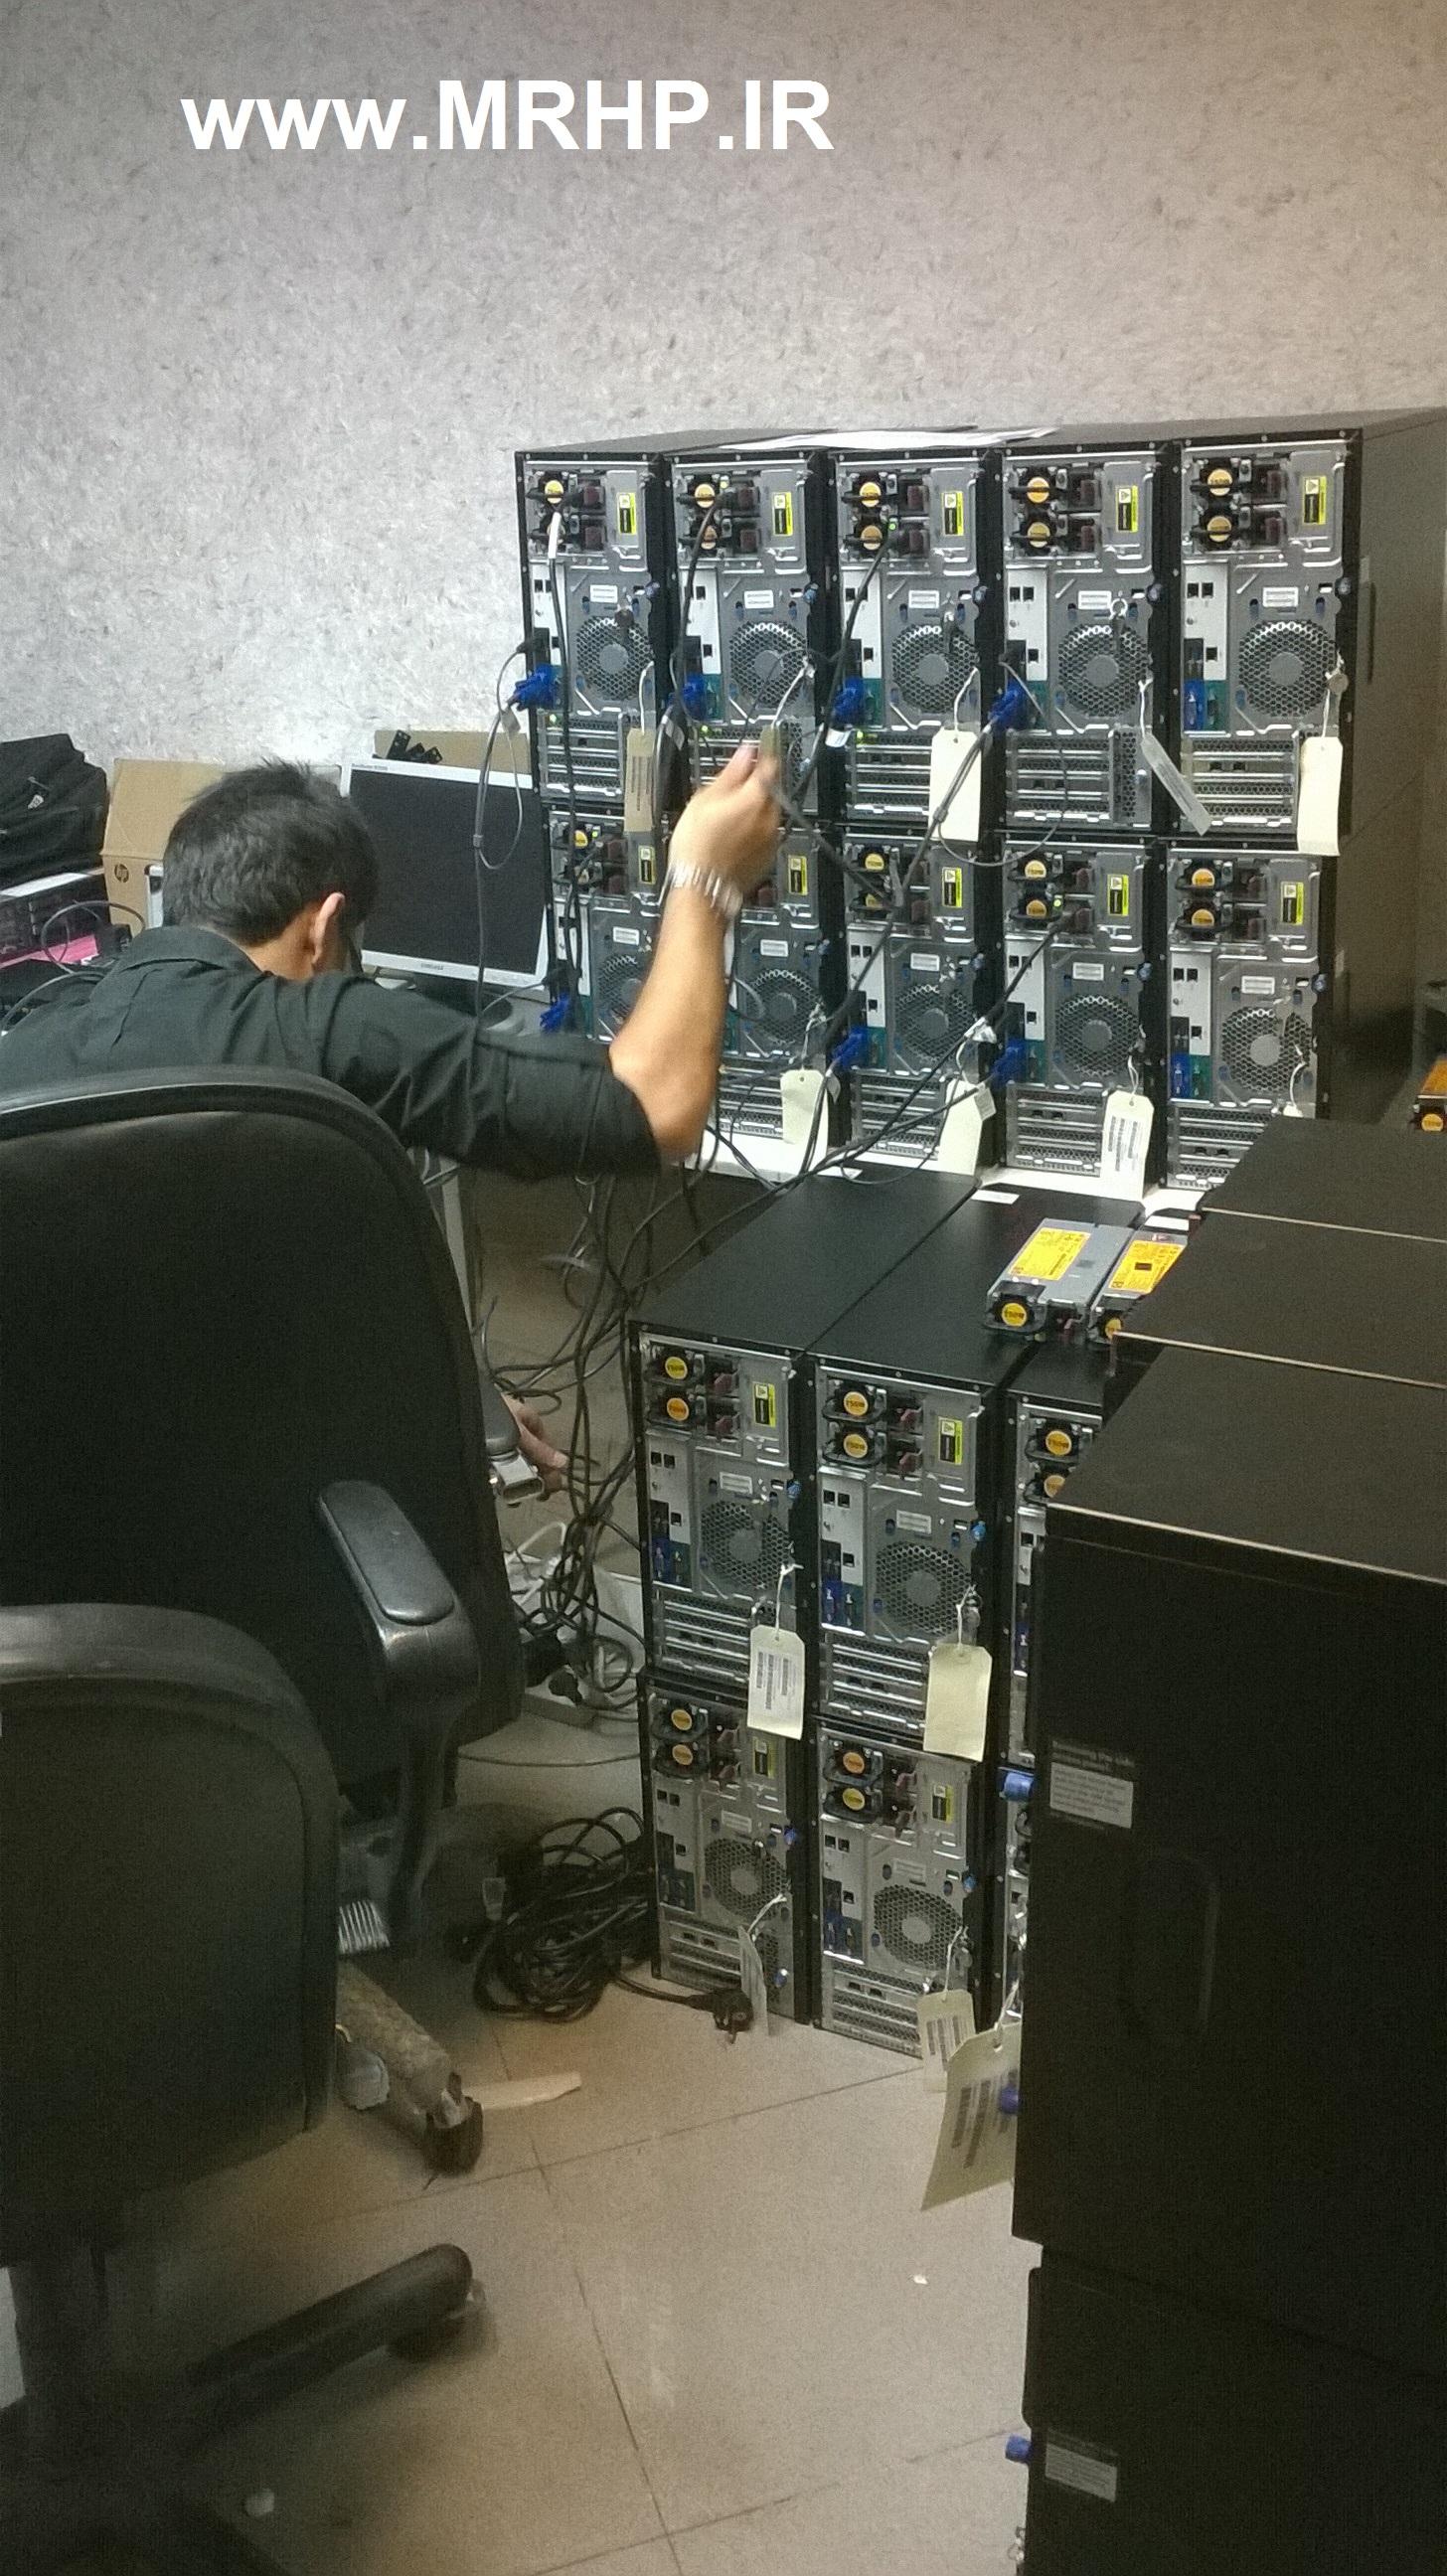 فروش و مشاوره سرور hp ML110 G9 , سرورهای ML110 G9 فروش ML110 G9, سرور اچ پی, HP ProLiant ML110 G9, ML110 G9,ml110 g9 سرور ML110 G9 سرور اچ پی,فایل سرور ML110 G9,